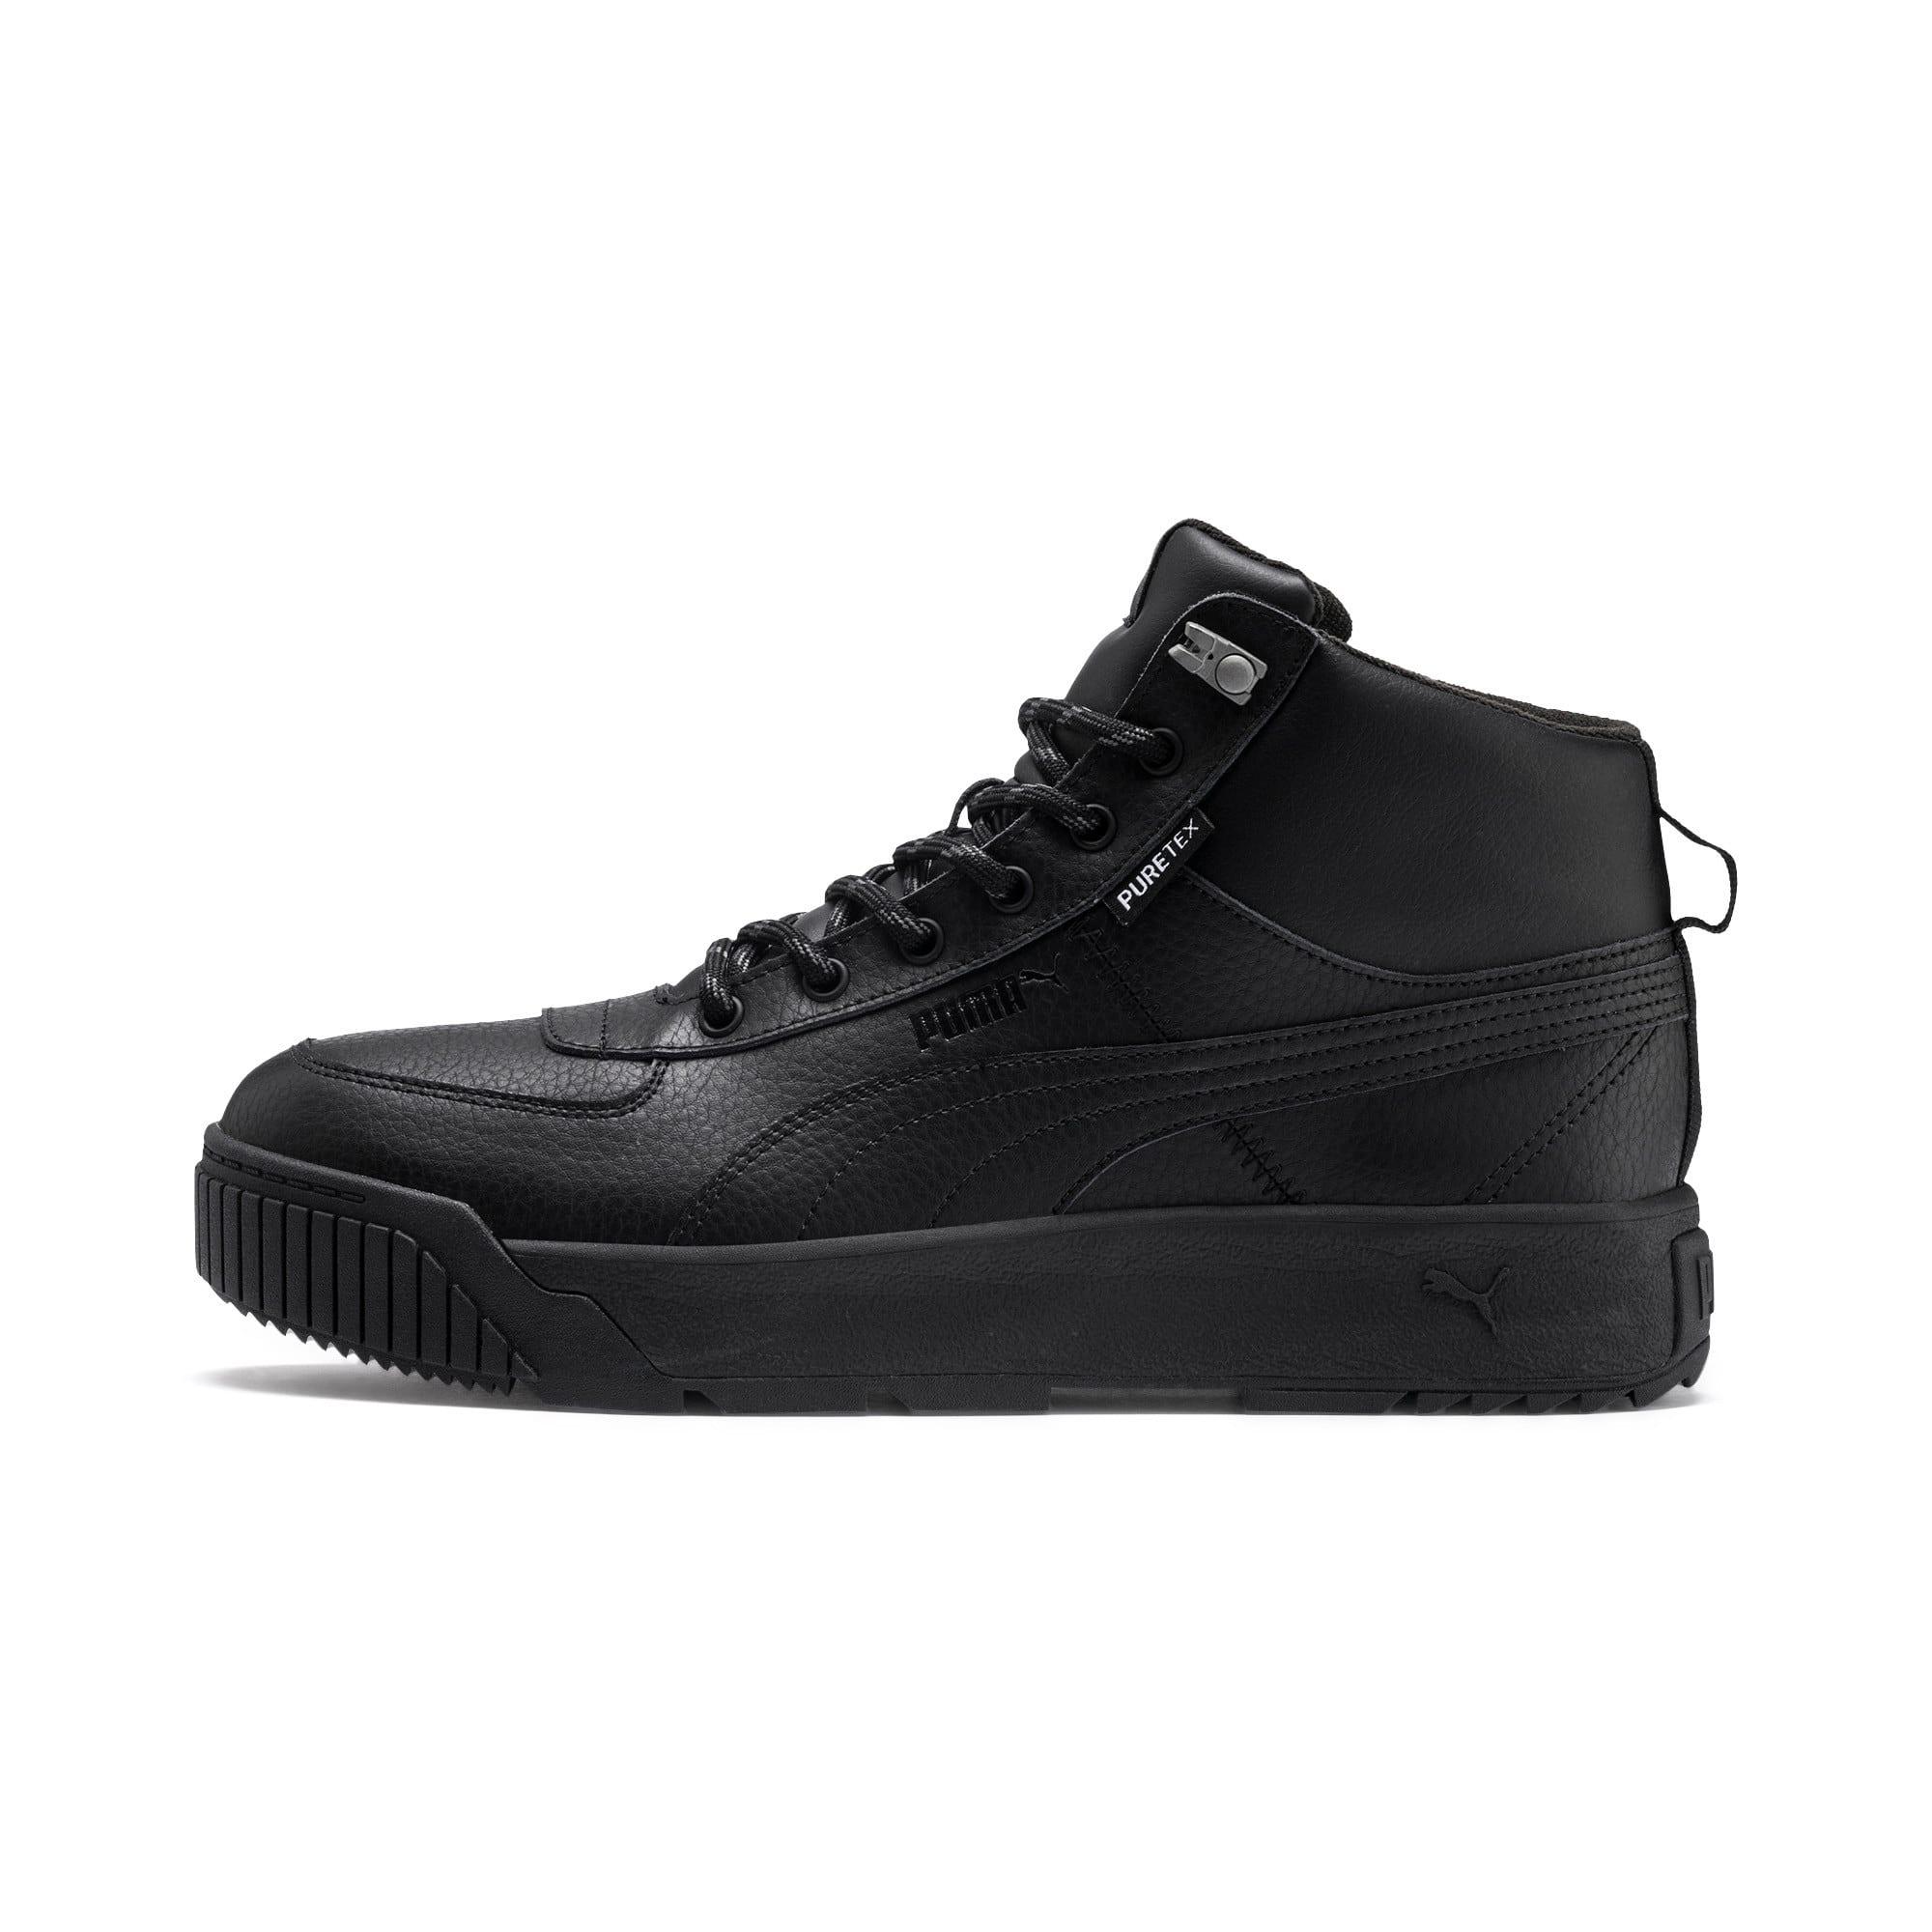 Thumbnail 1 of Tarrenz SB PURETEX Mid Sneakers, Puma Black-Puma Black, medium